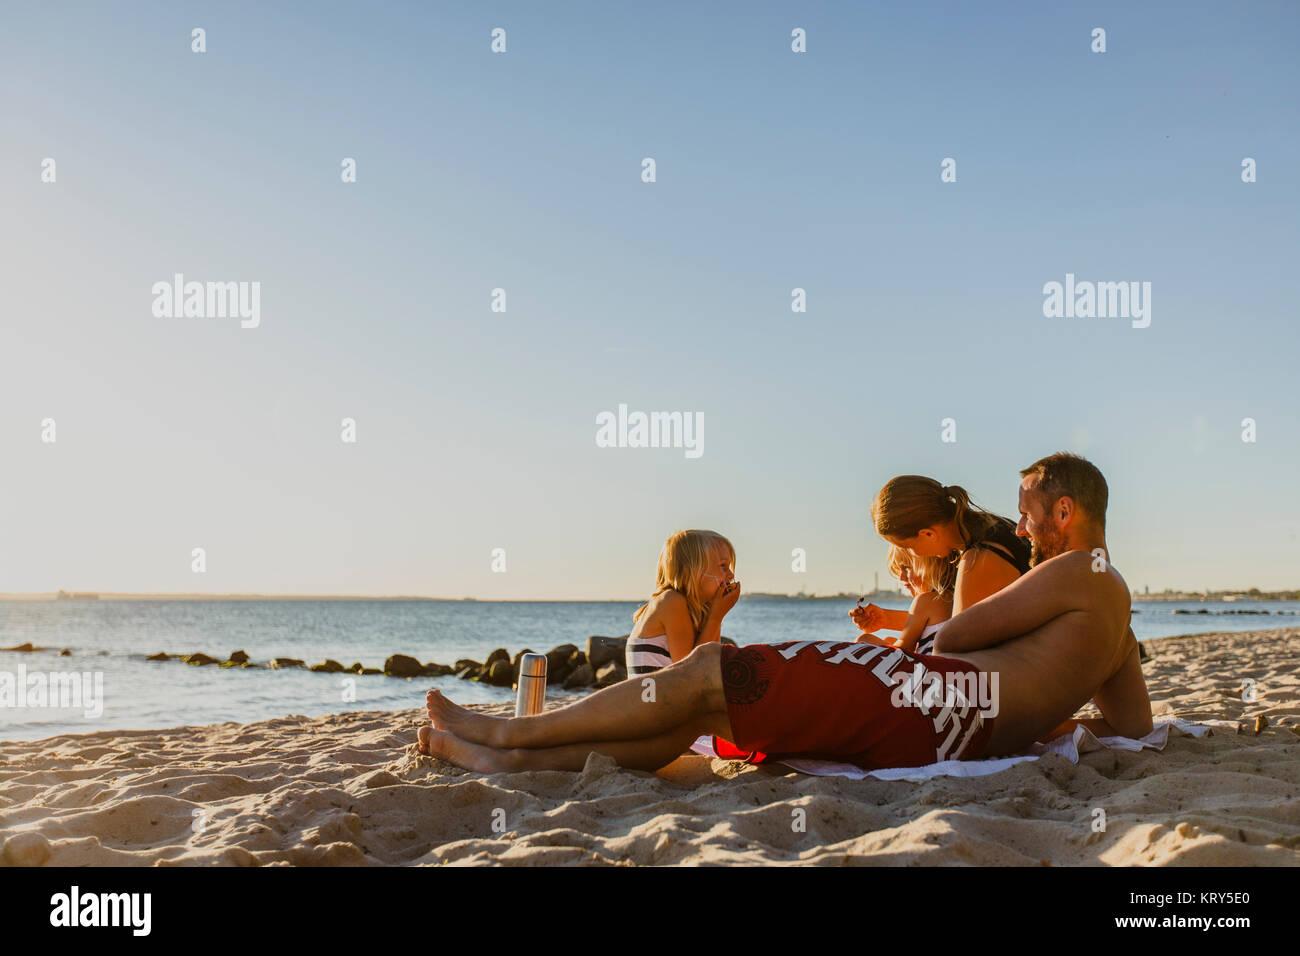 A family on the beach Stock Photo